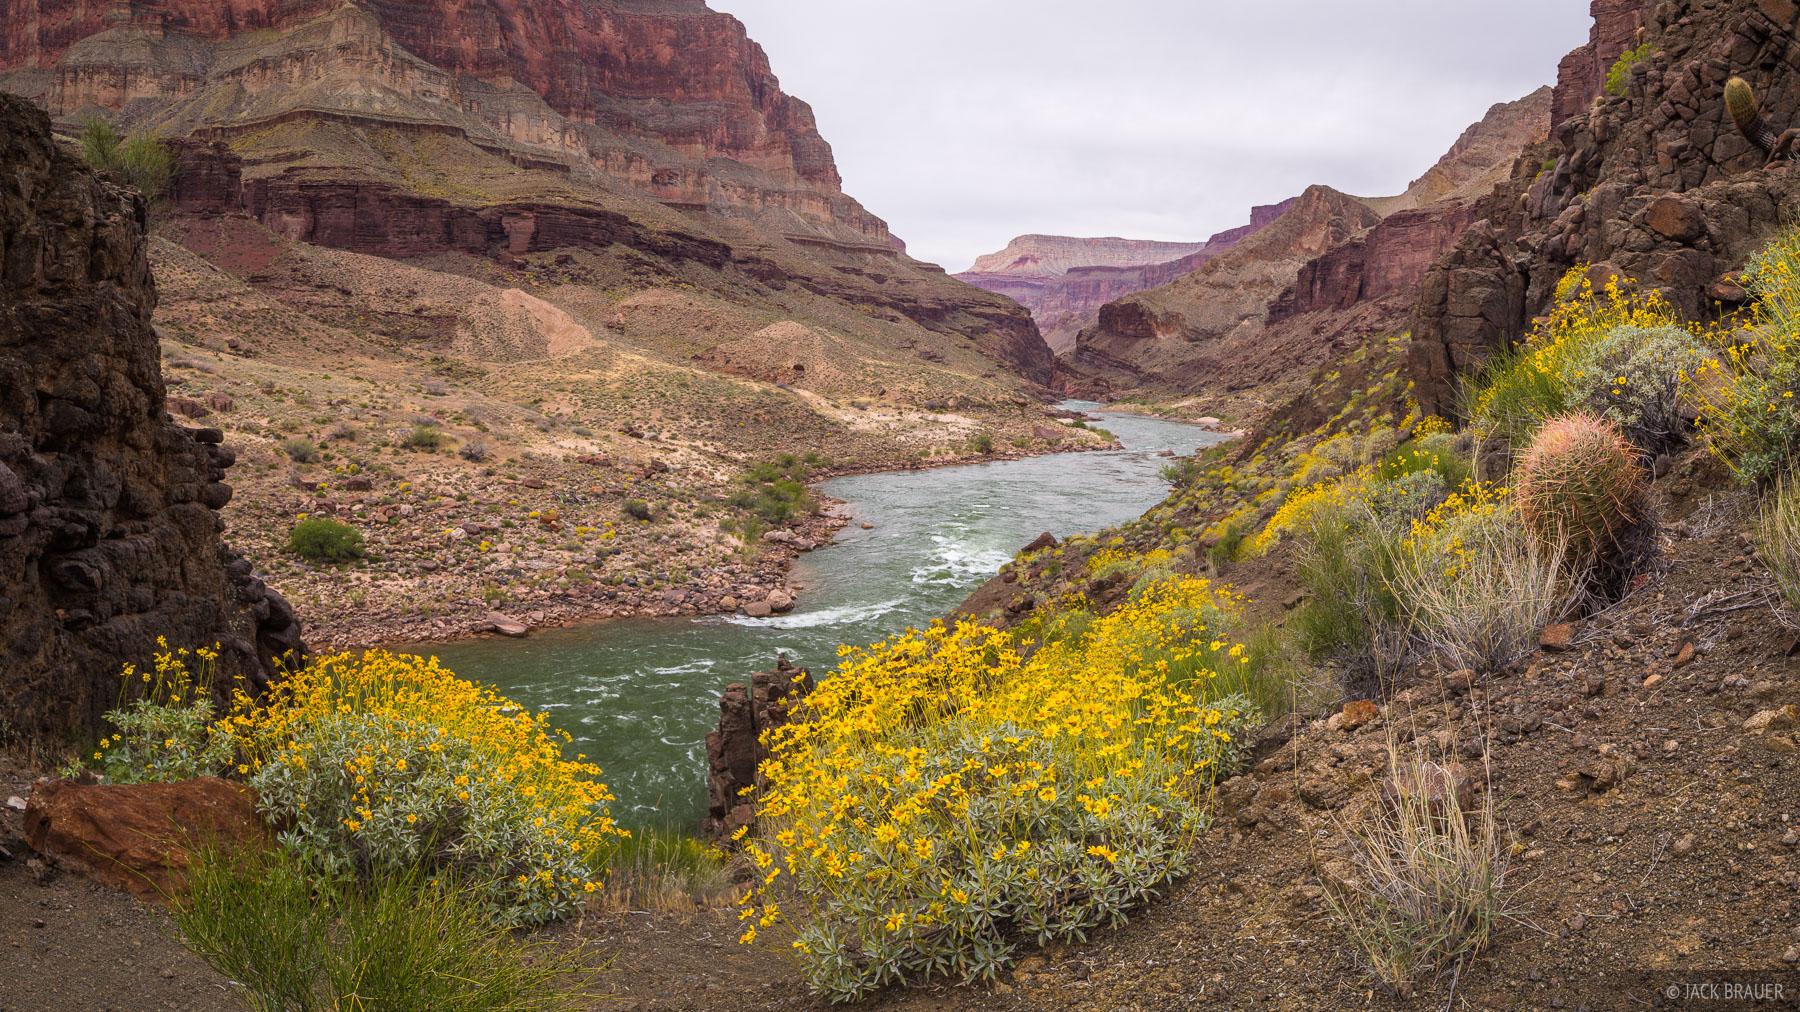 Wildflowers along the Colorado River.